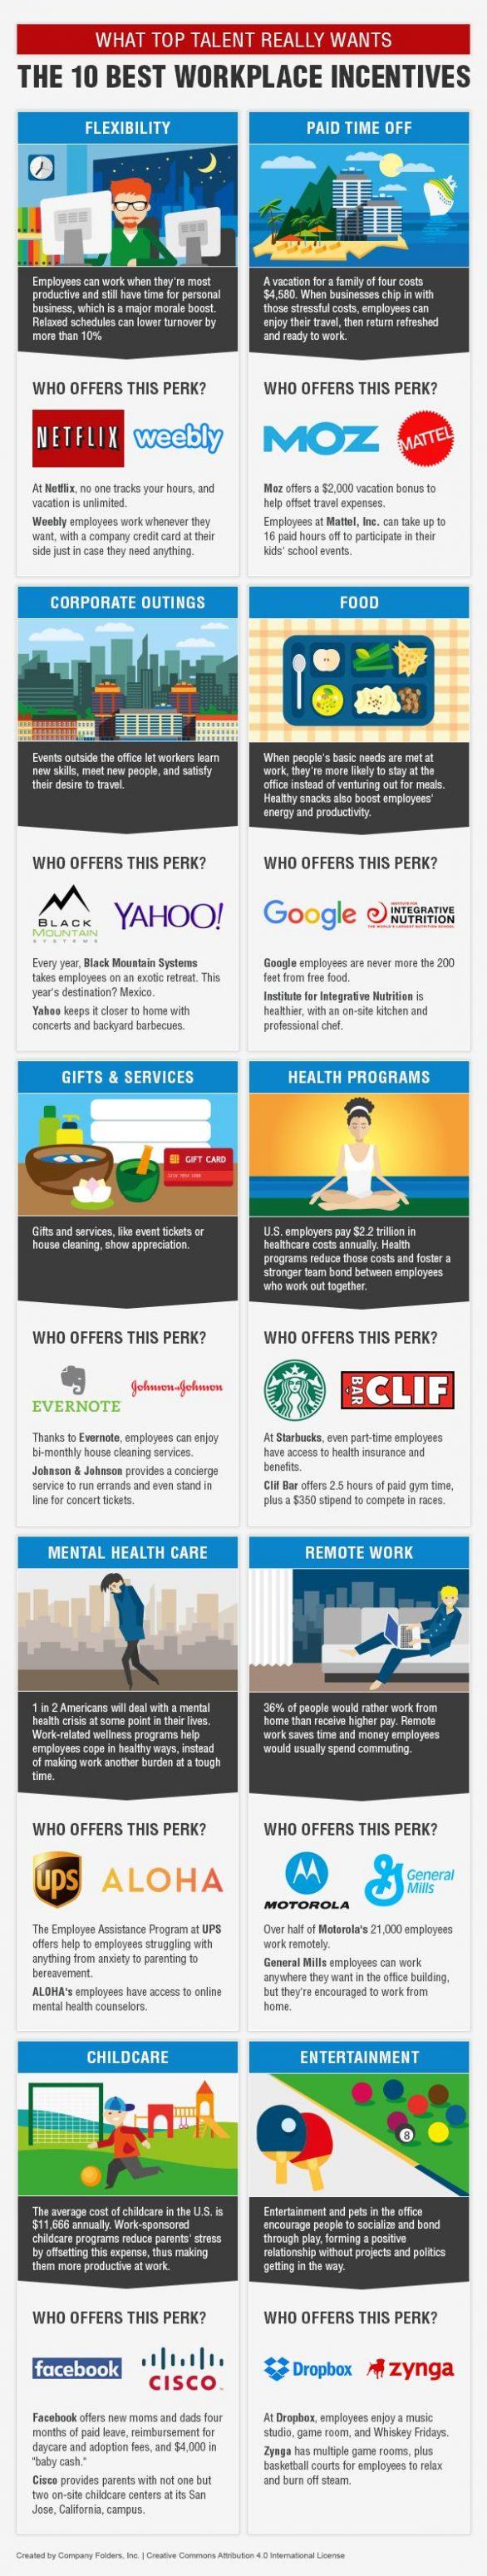 10-best-workplace-perks